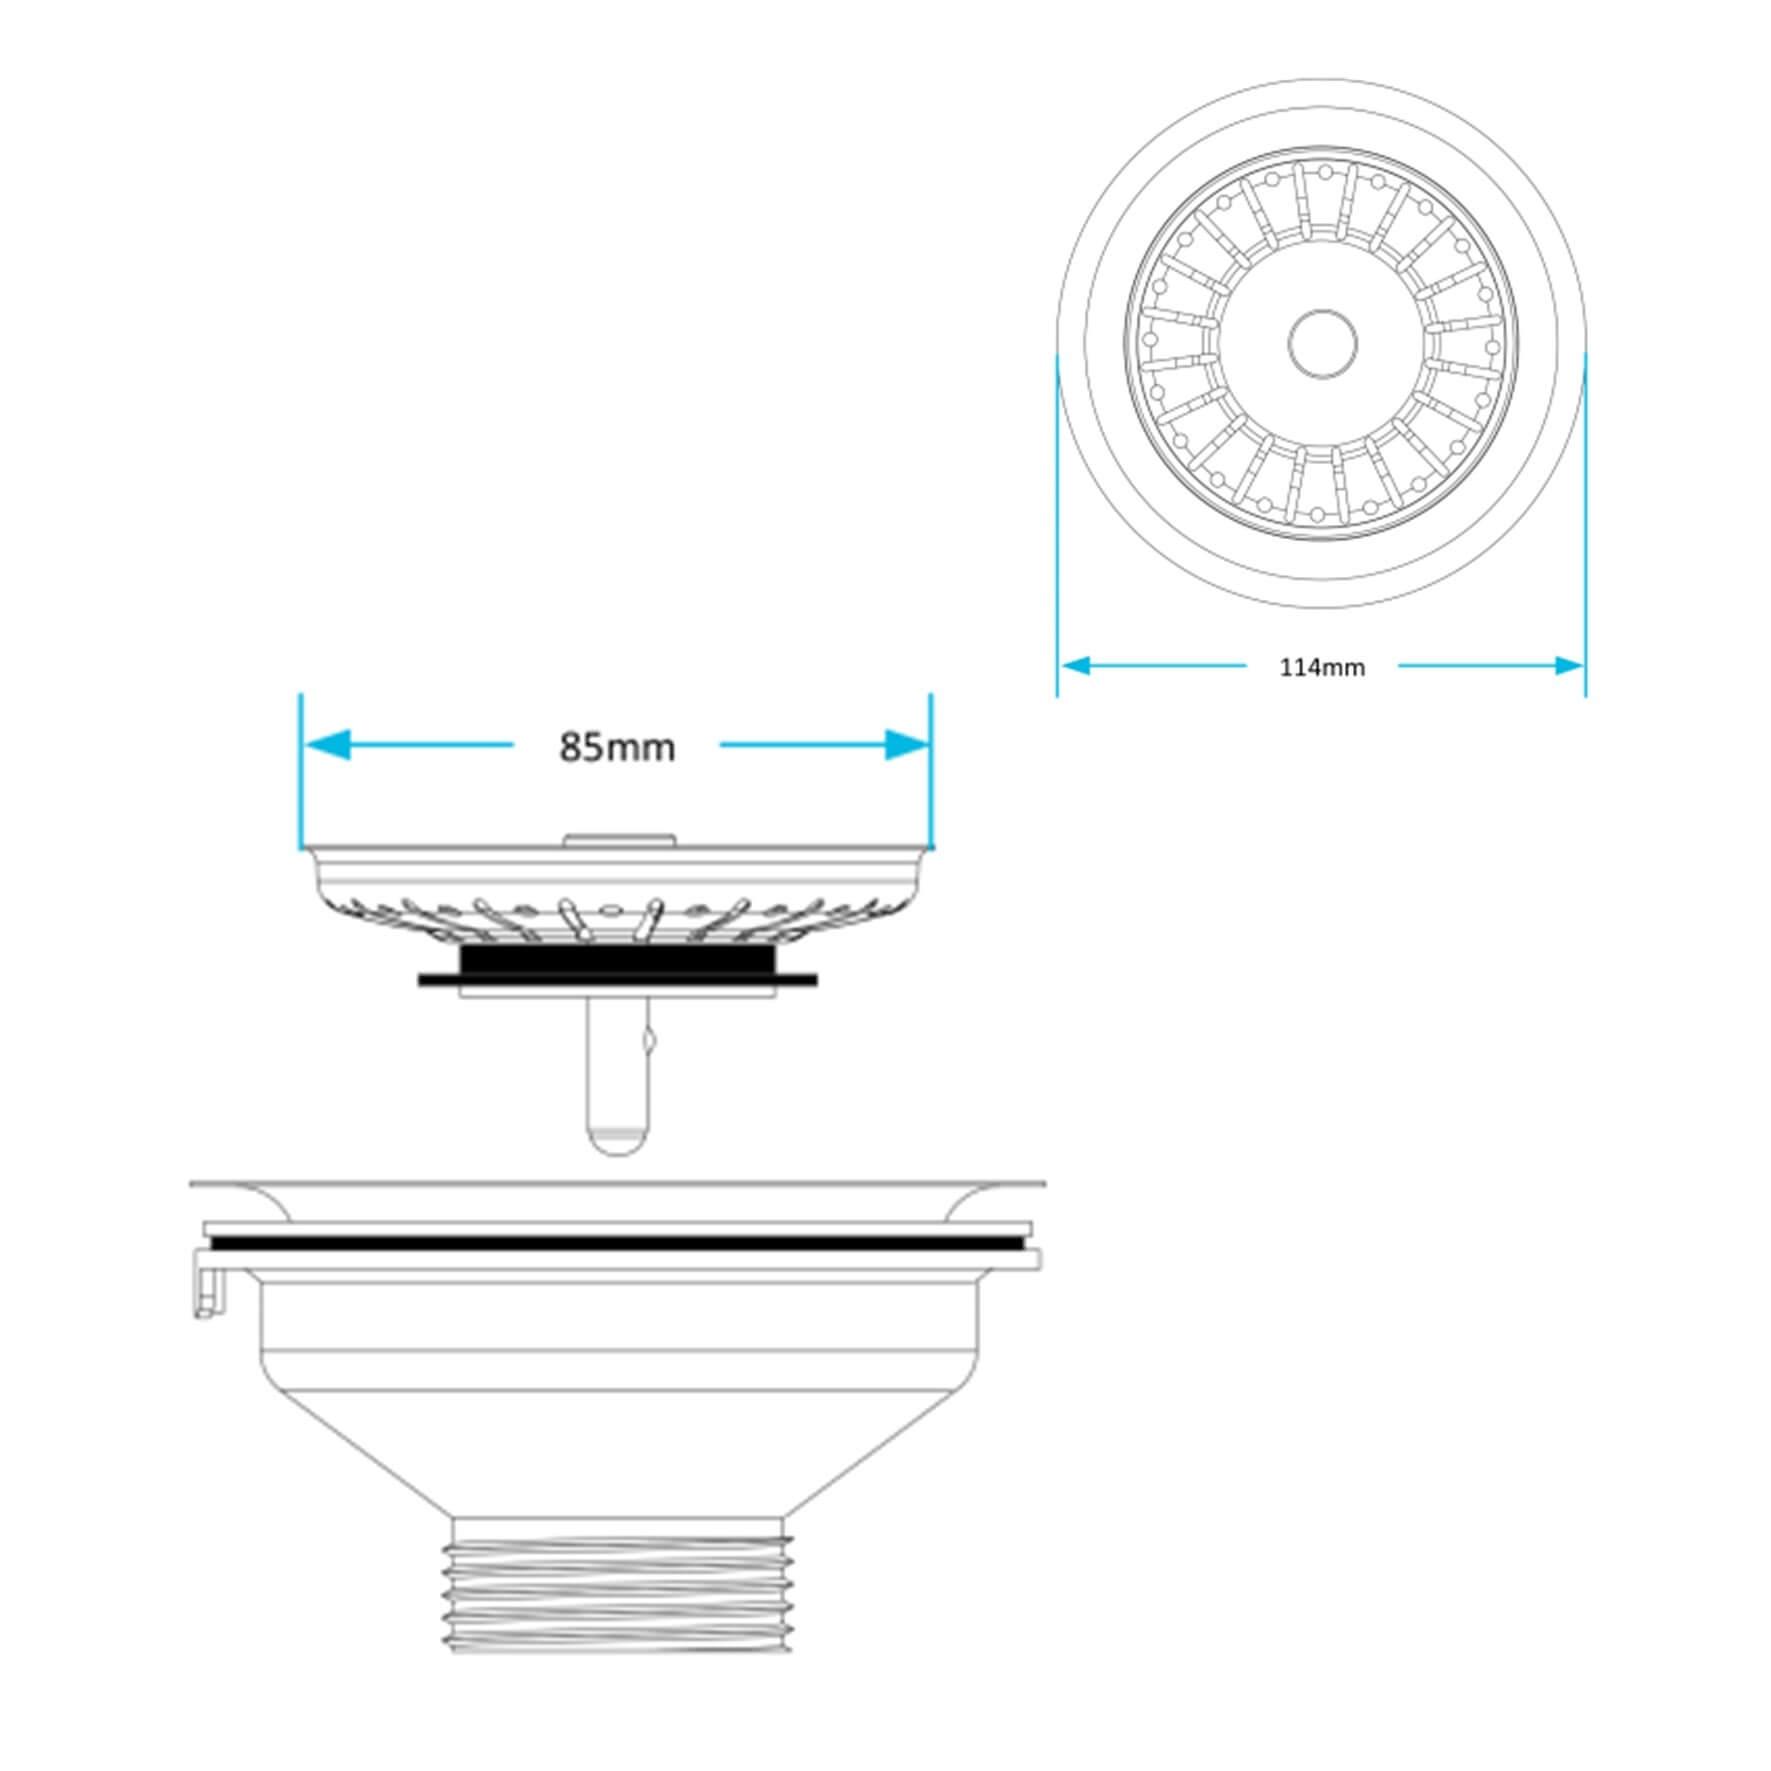 Viva PP0011 measurements